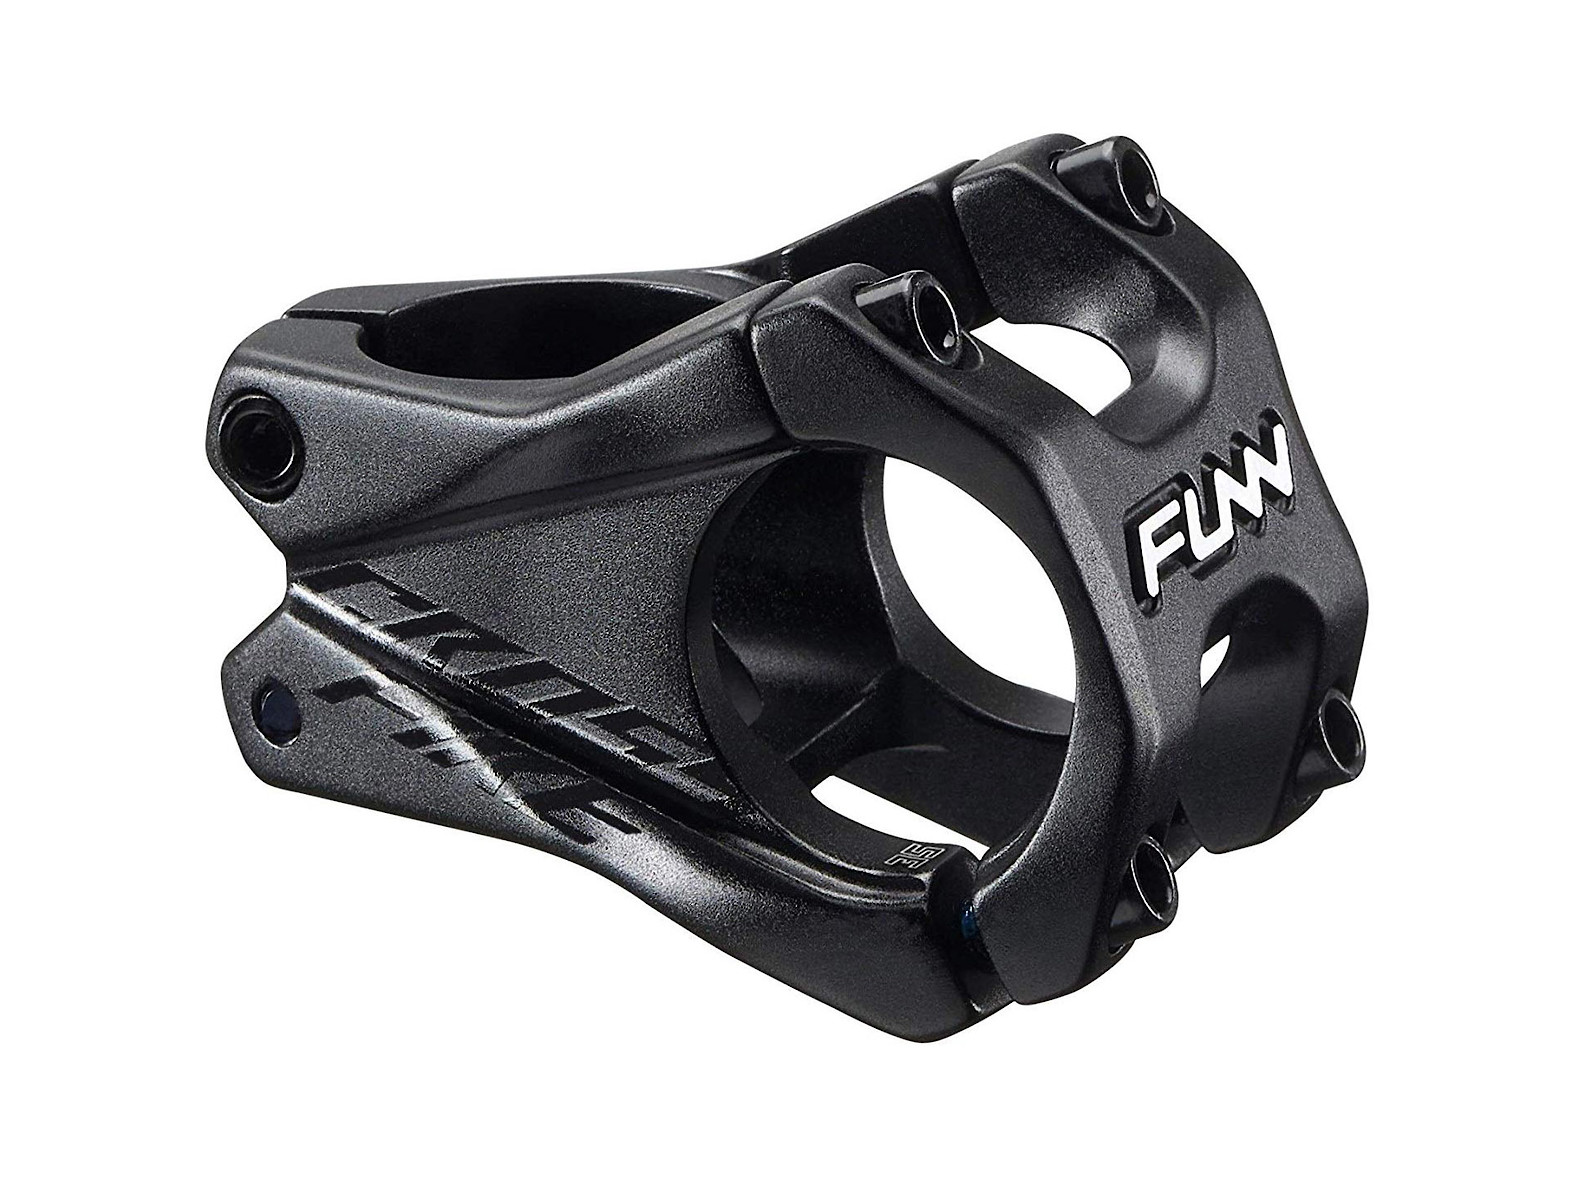 FUNN Crossfire (black)